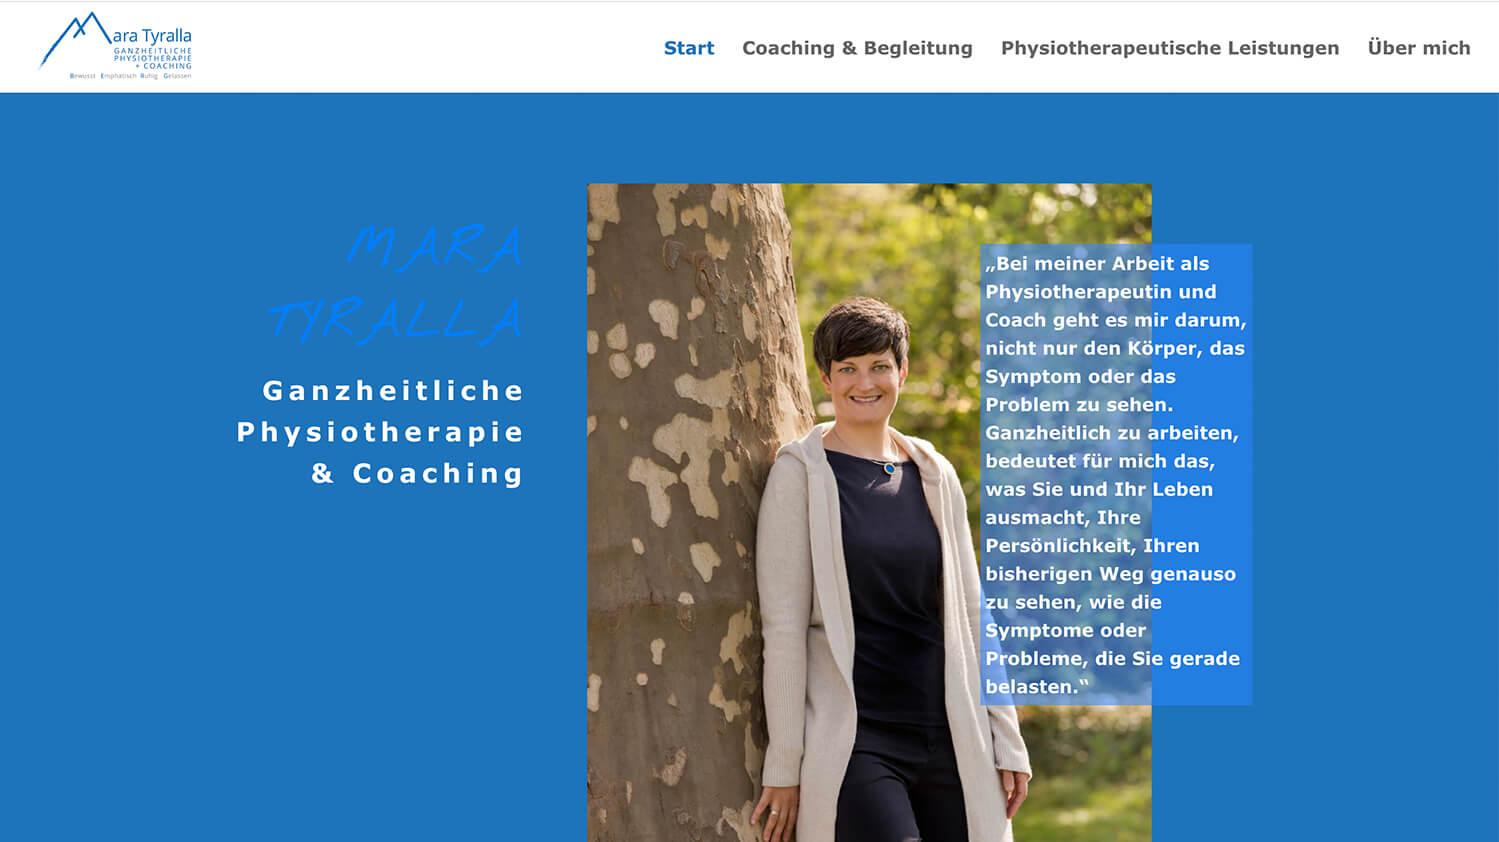 Mara Tyralla - Physiotherapie und Coaching